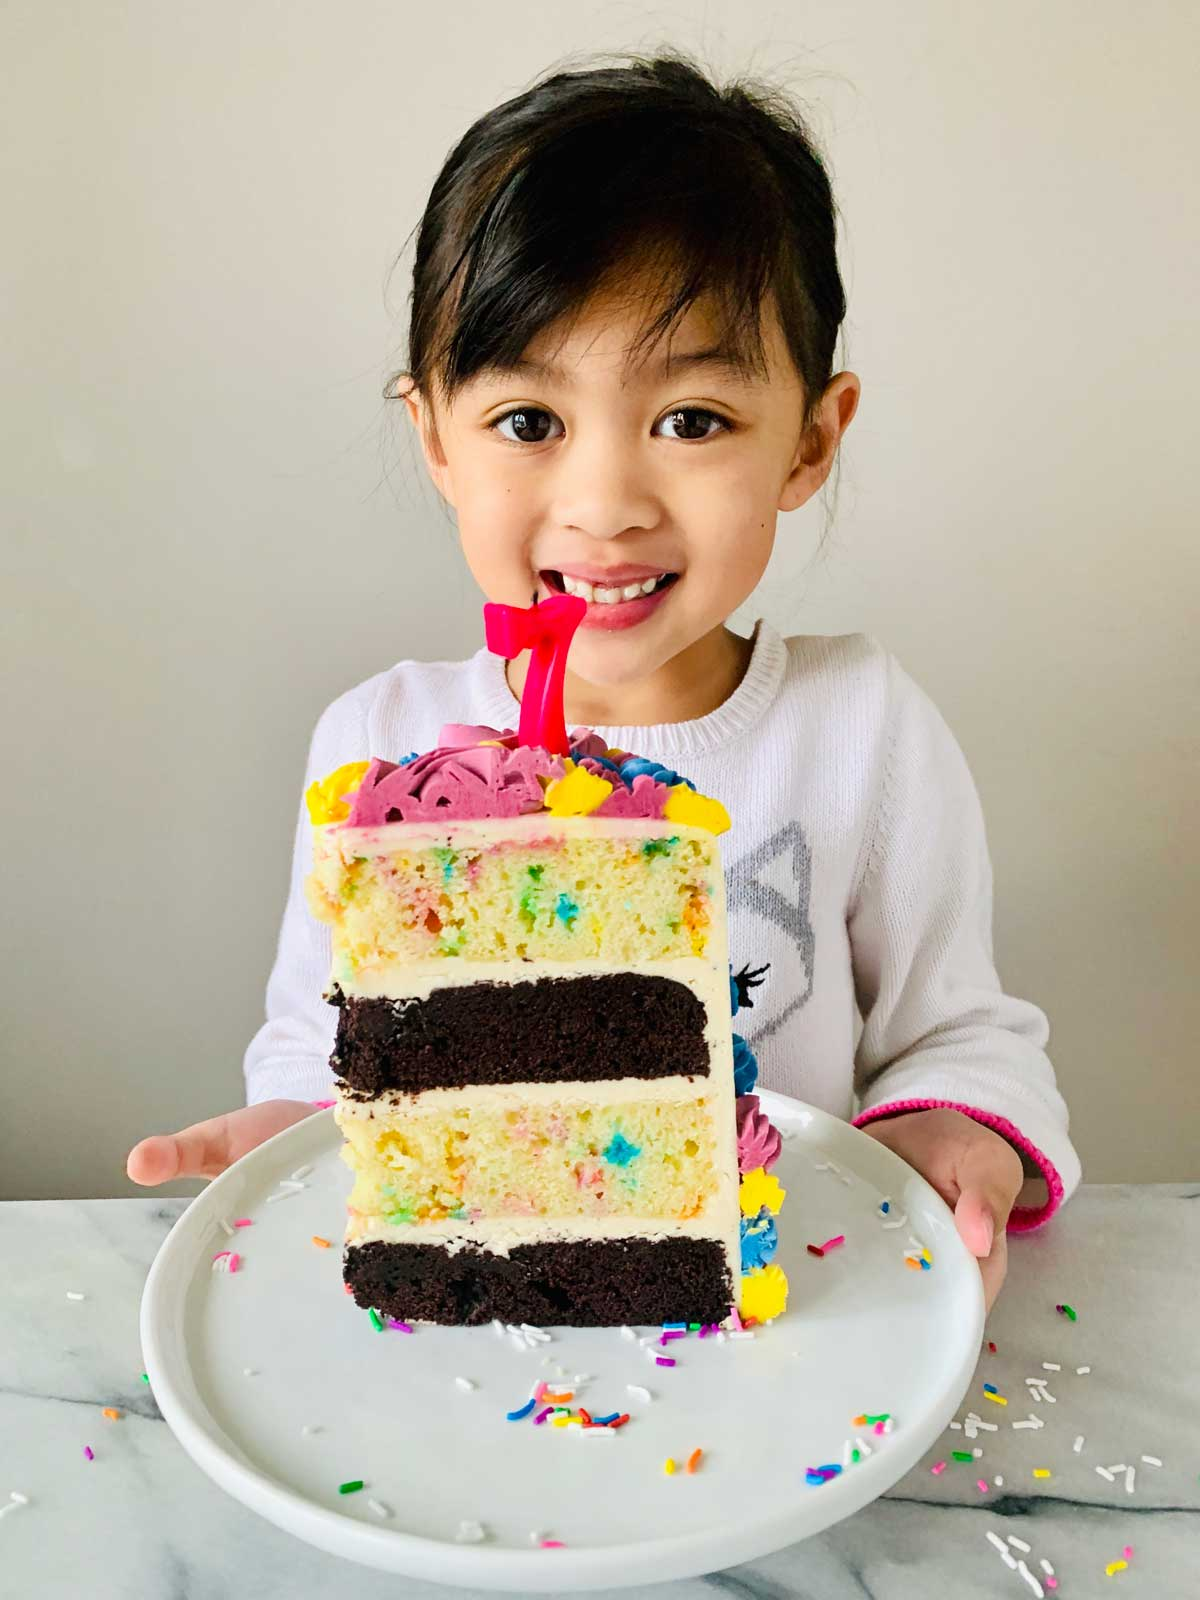 mica holding a slice of the unicorn birthday cake